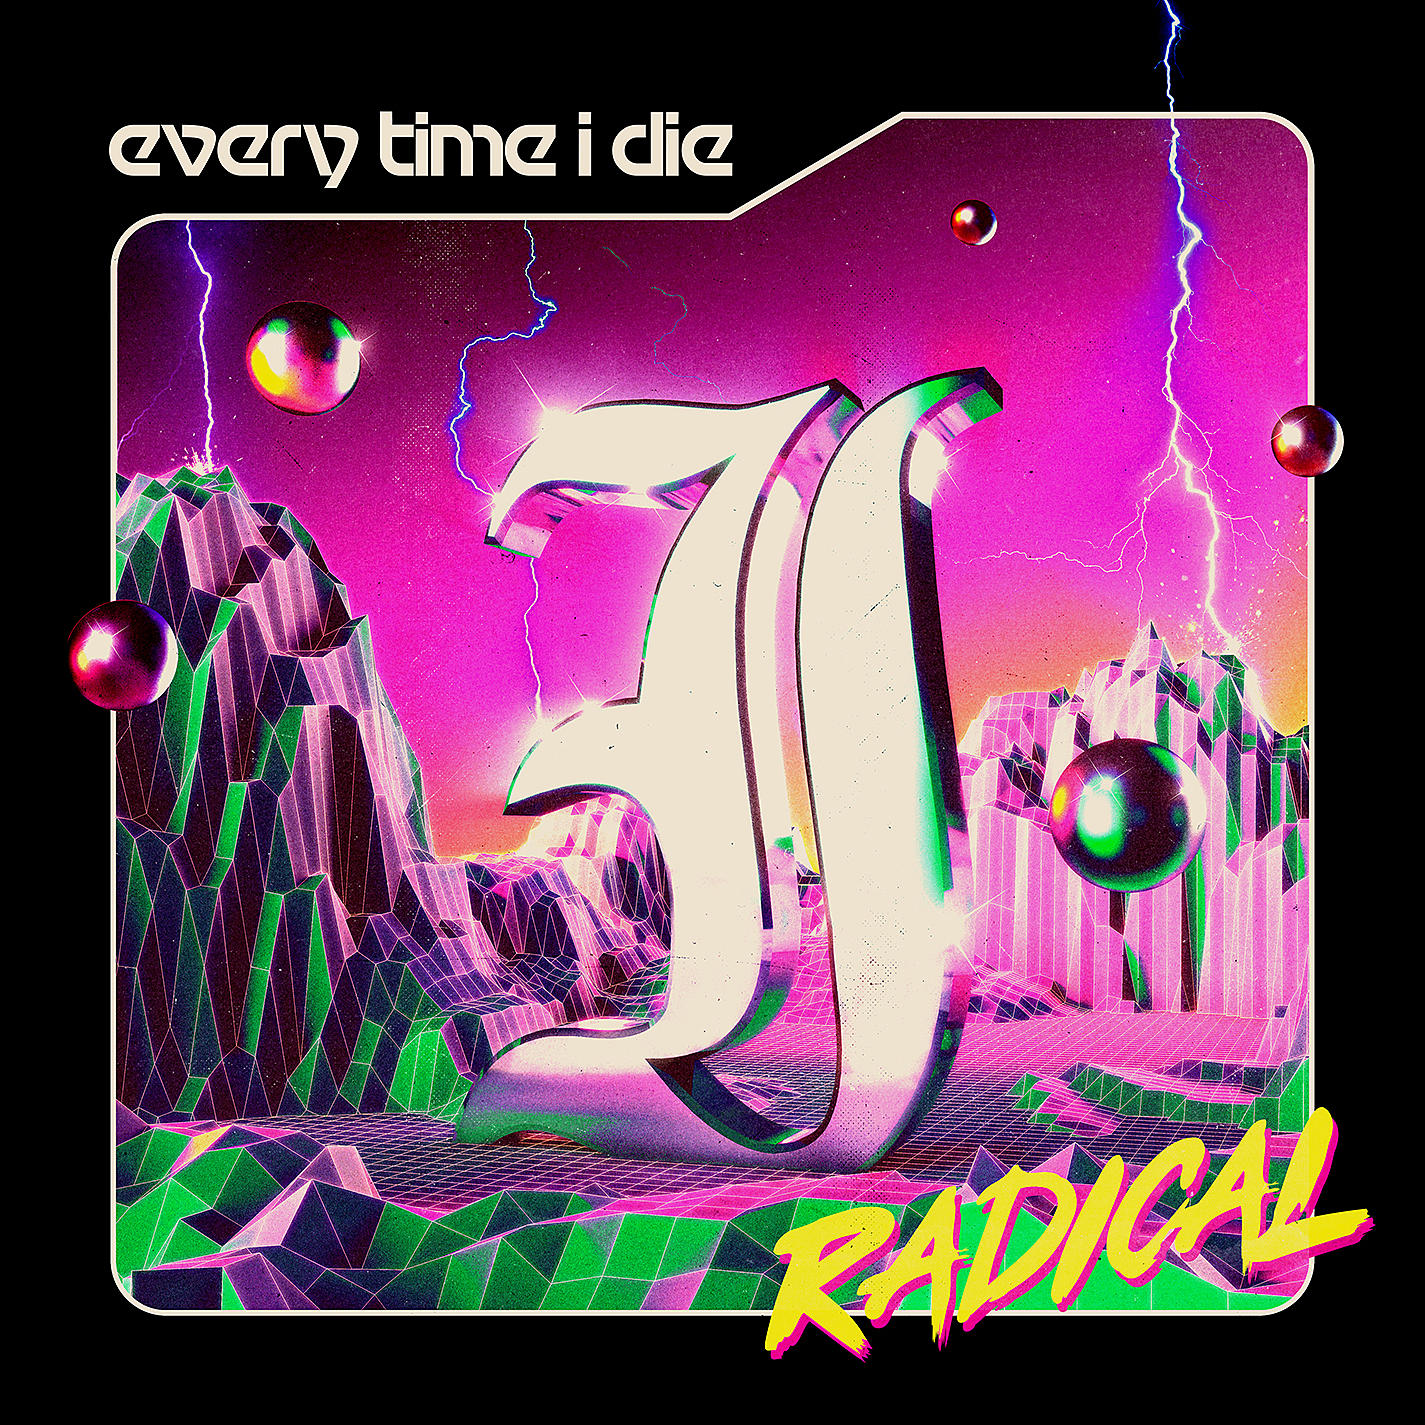 Every Time I Die - Página 2 Attachment-every-time-i-die-radical